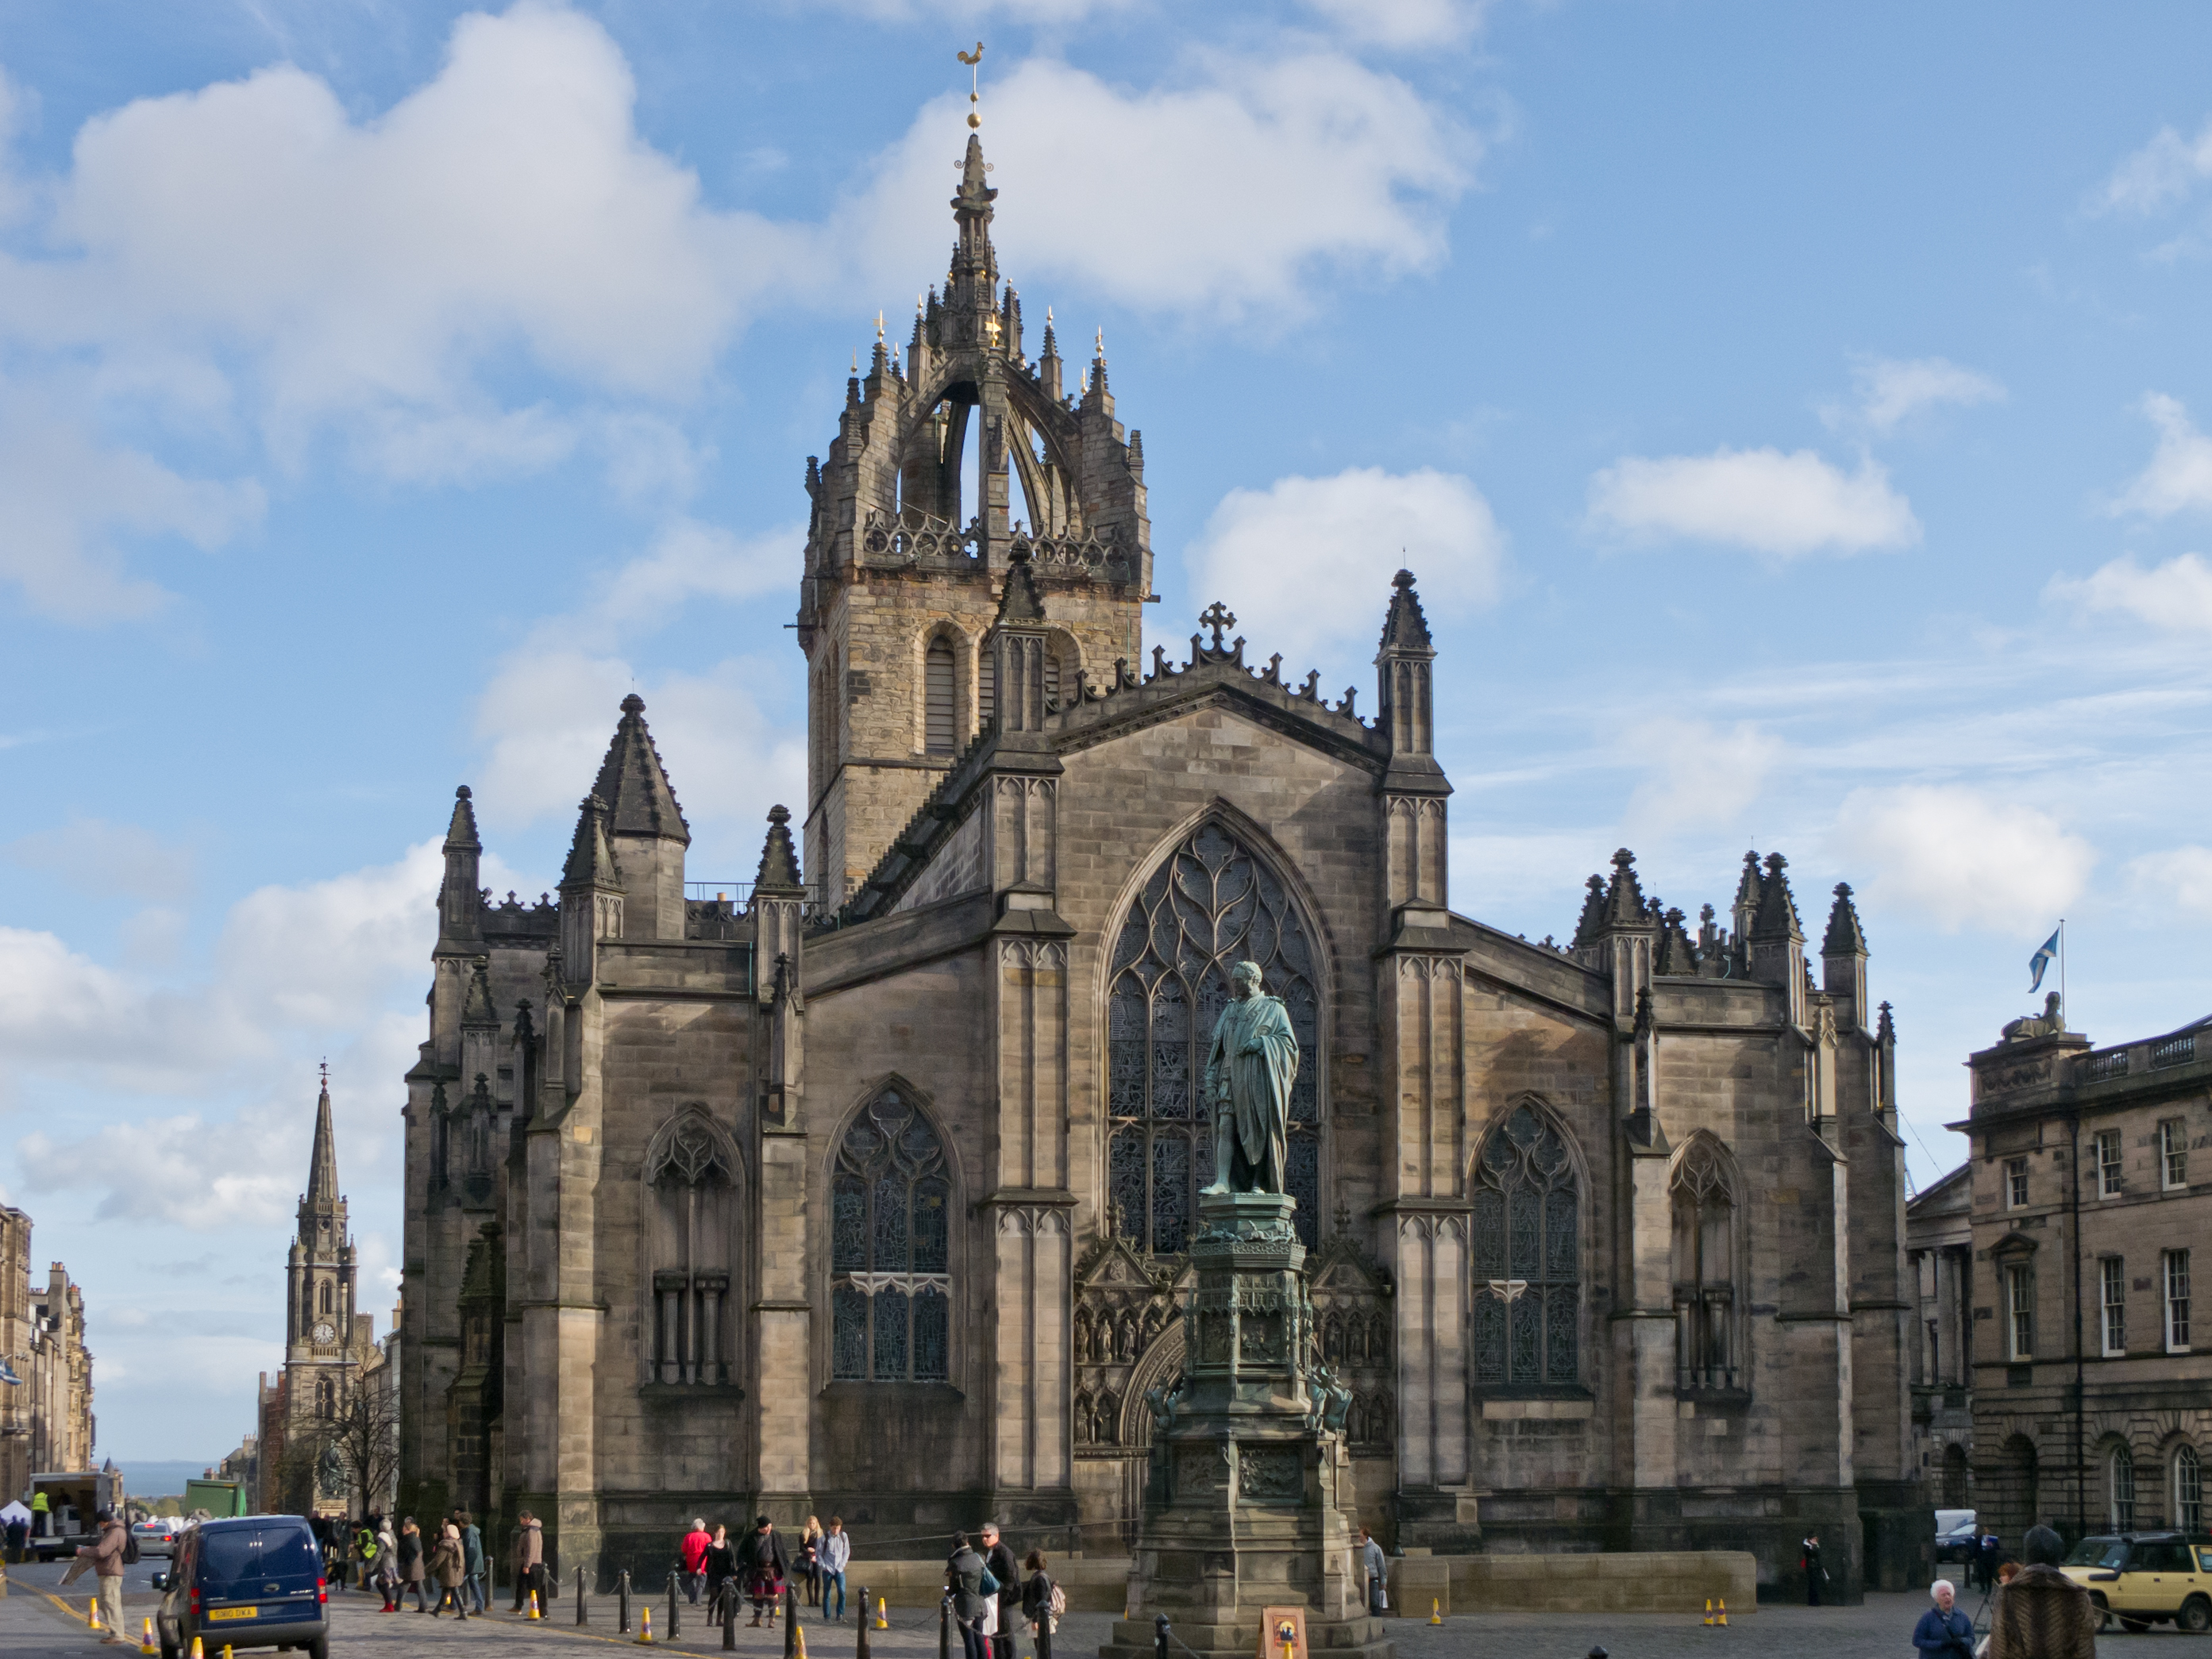 Catedral de Edimburgo - Wikipedia, la enciclopedia libre